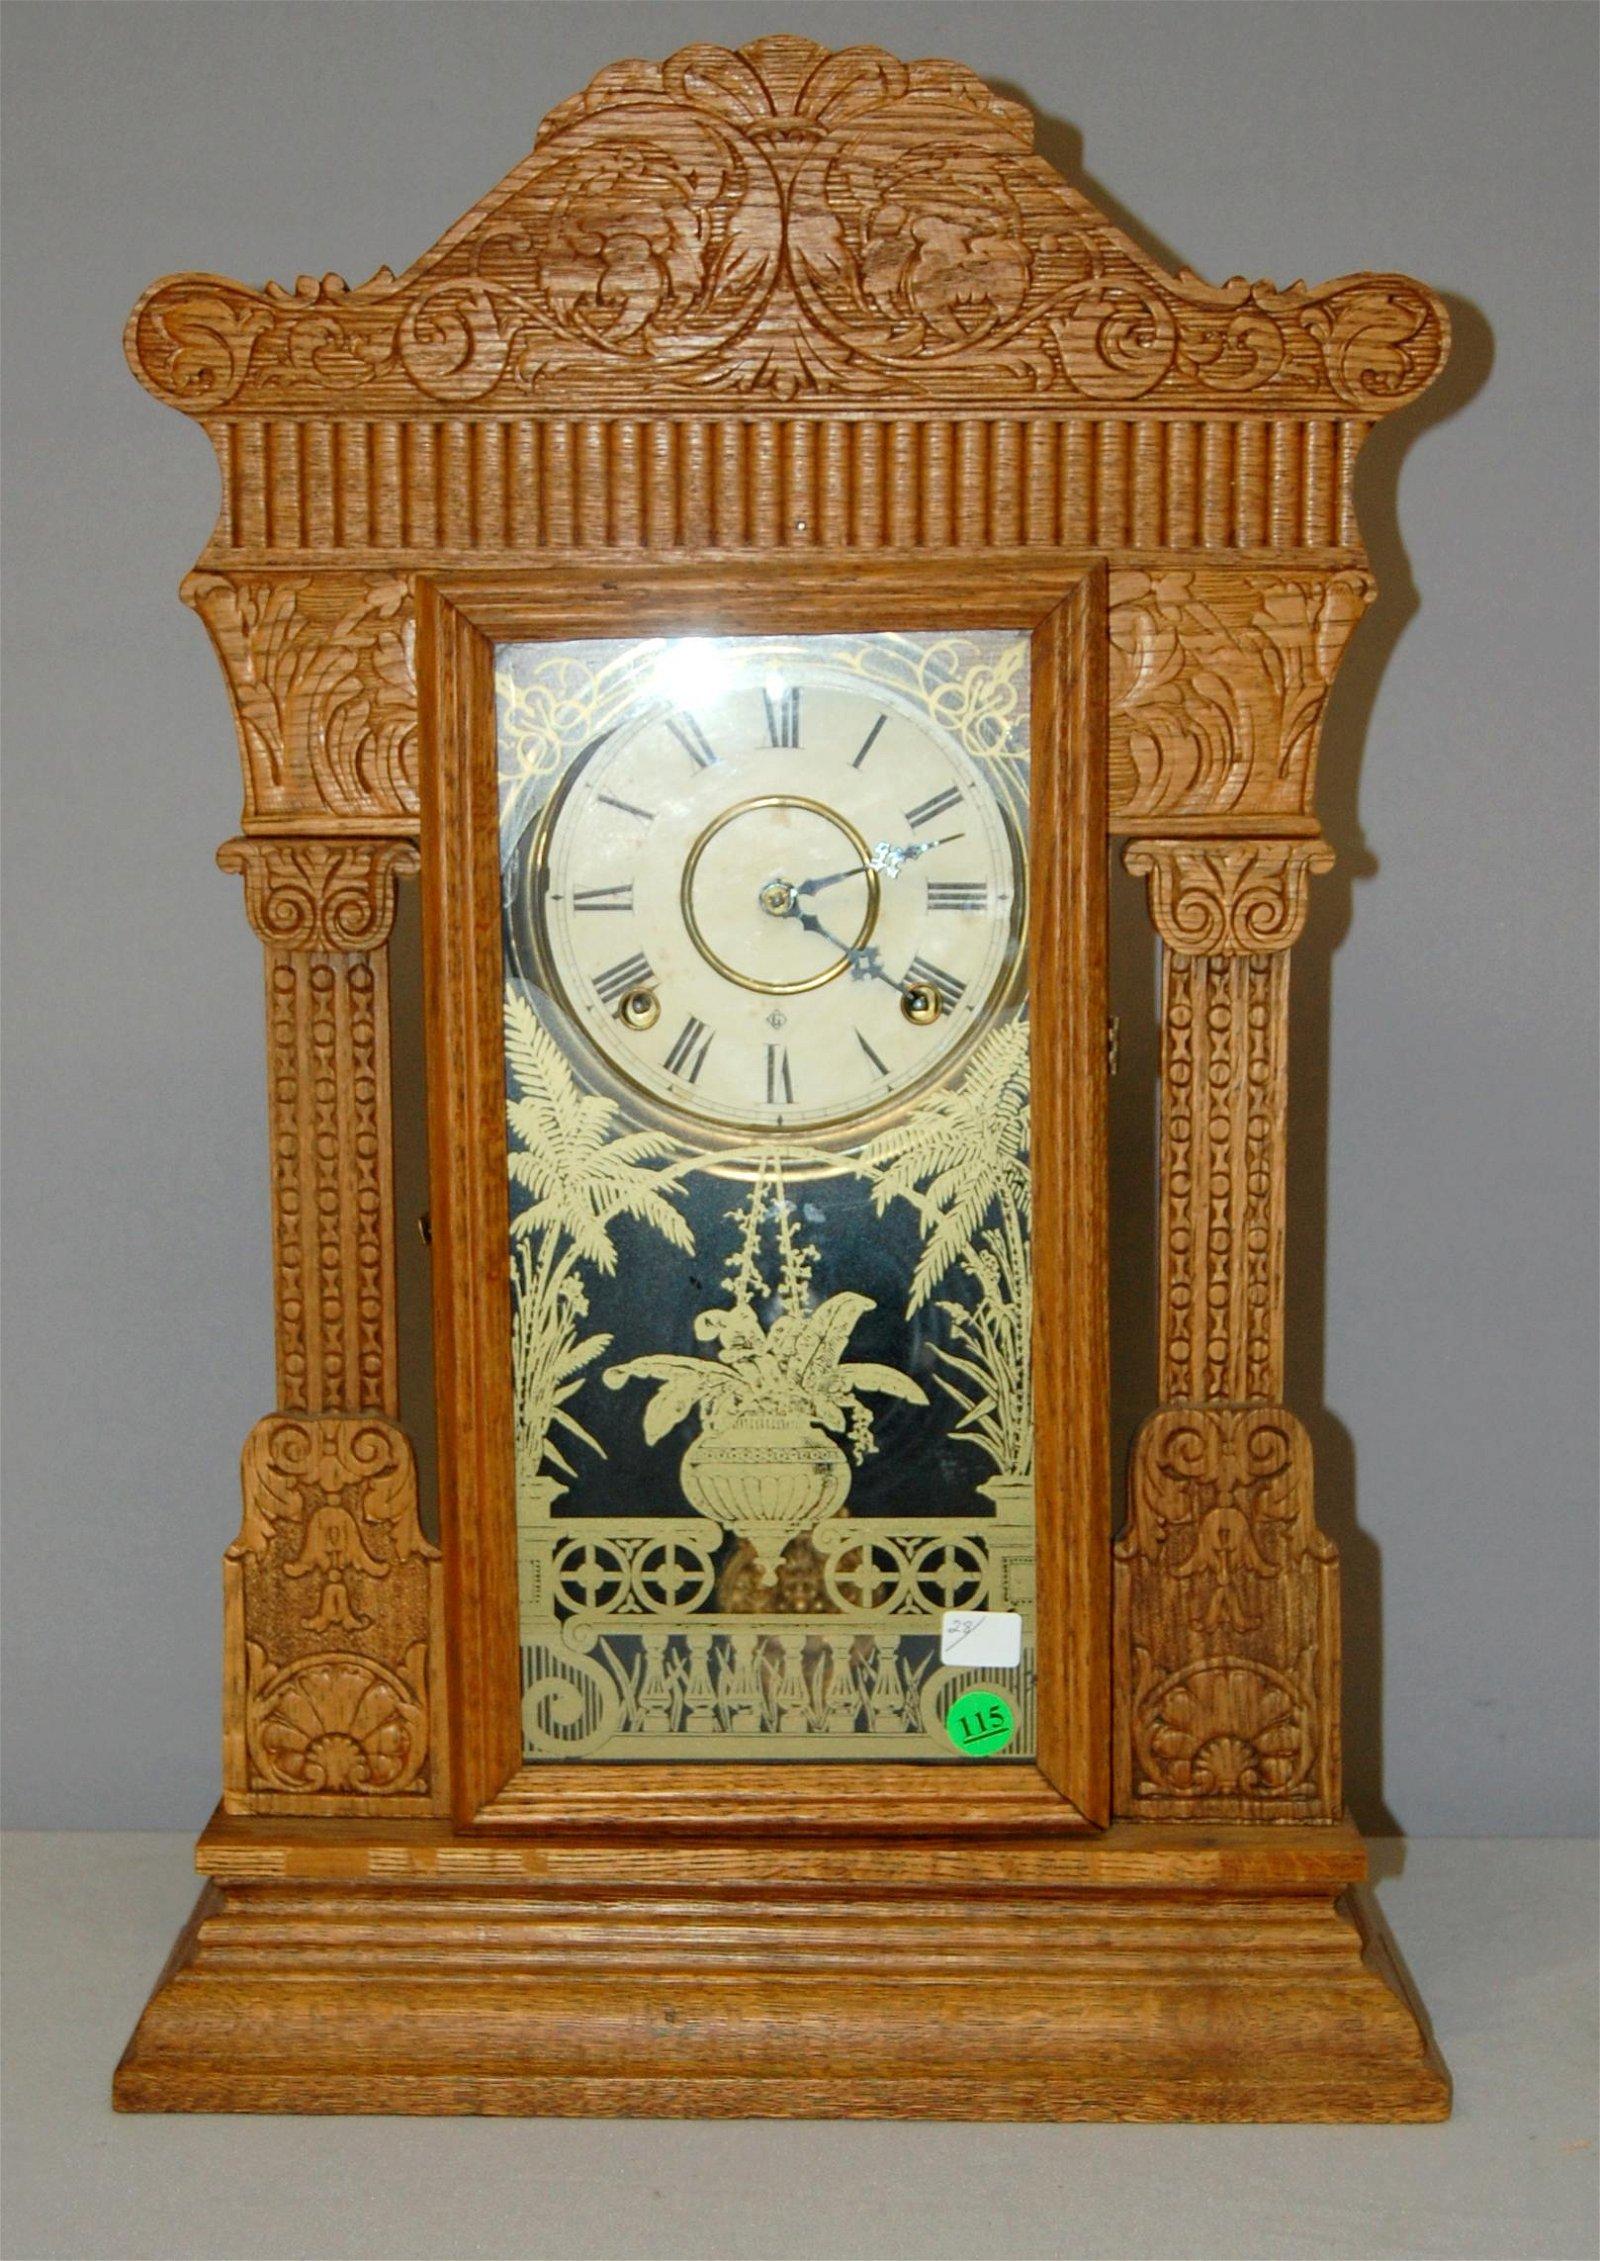 Gilbert Oak Antique Kitchen Clock: Signed paper dial,